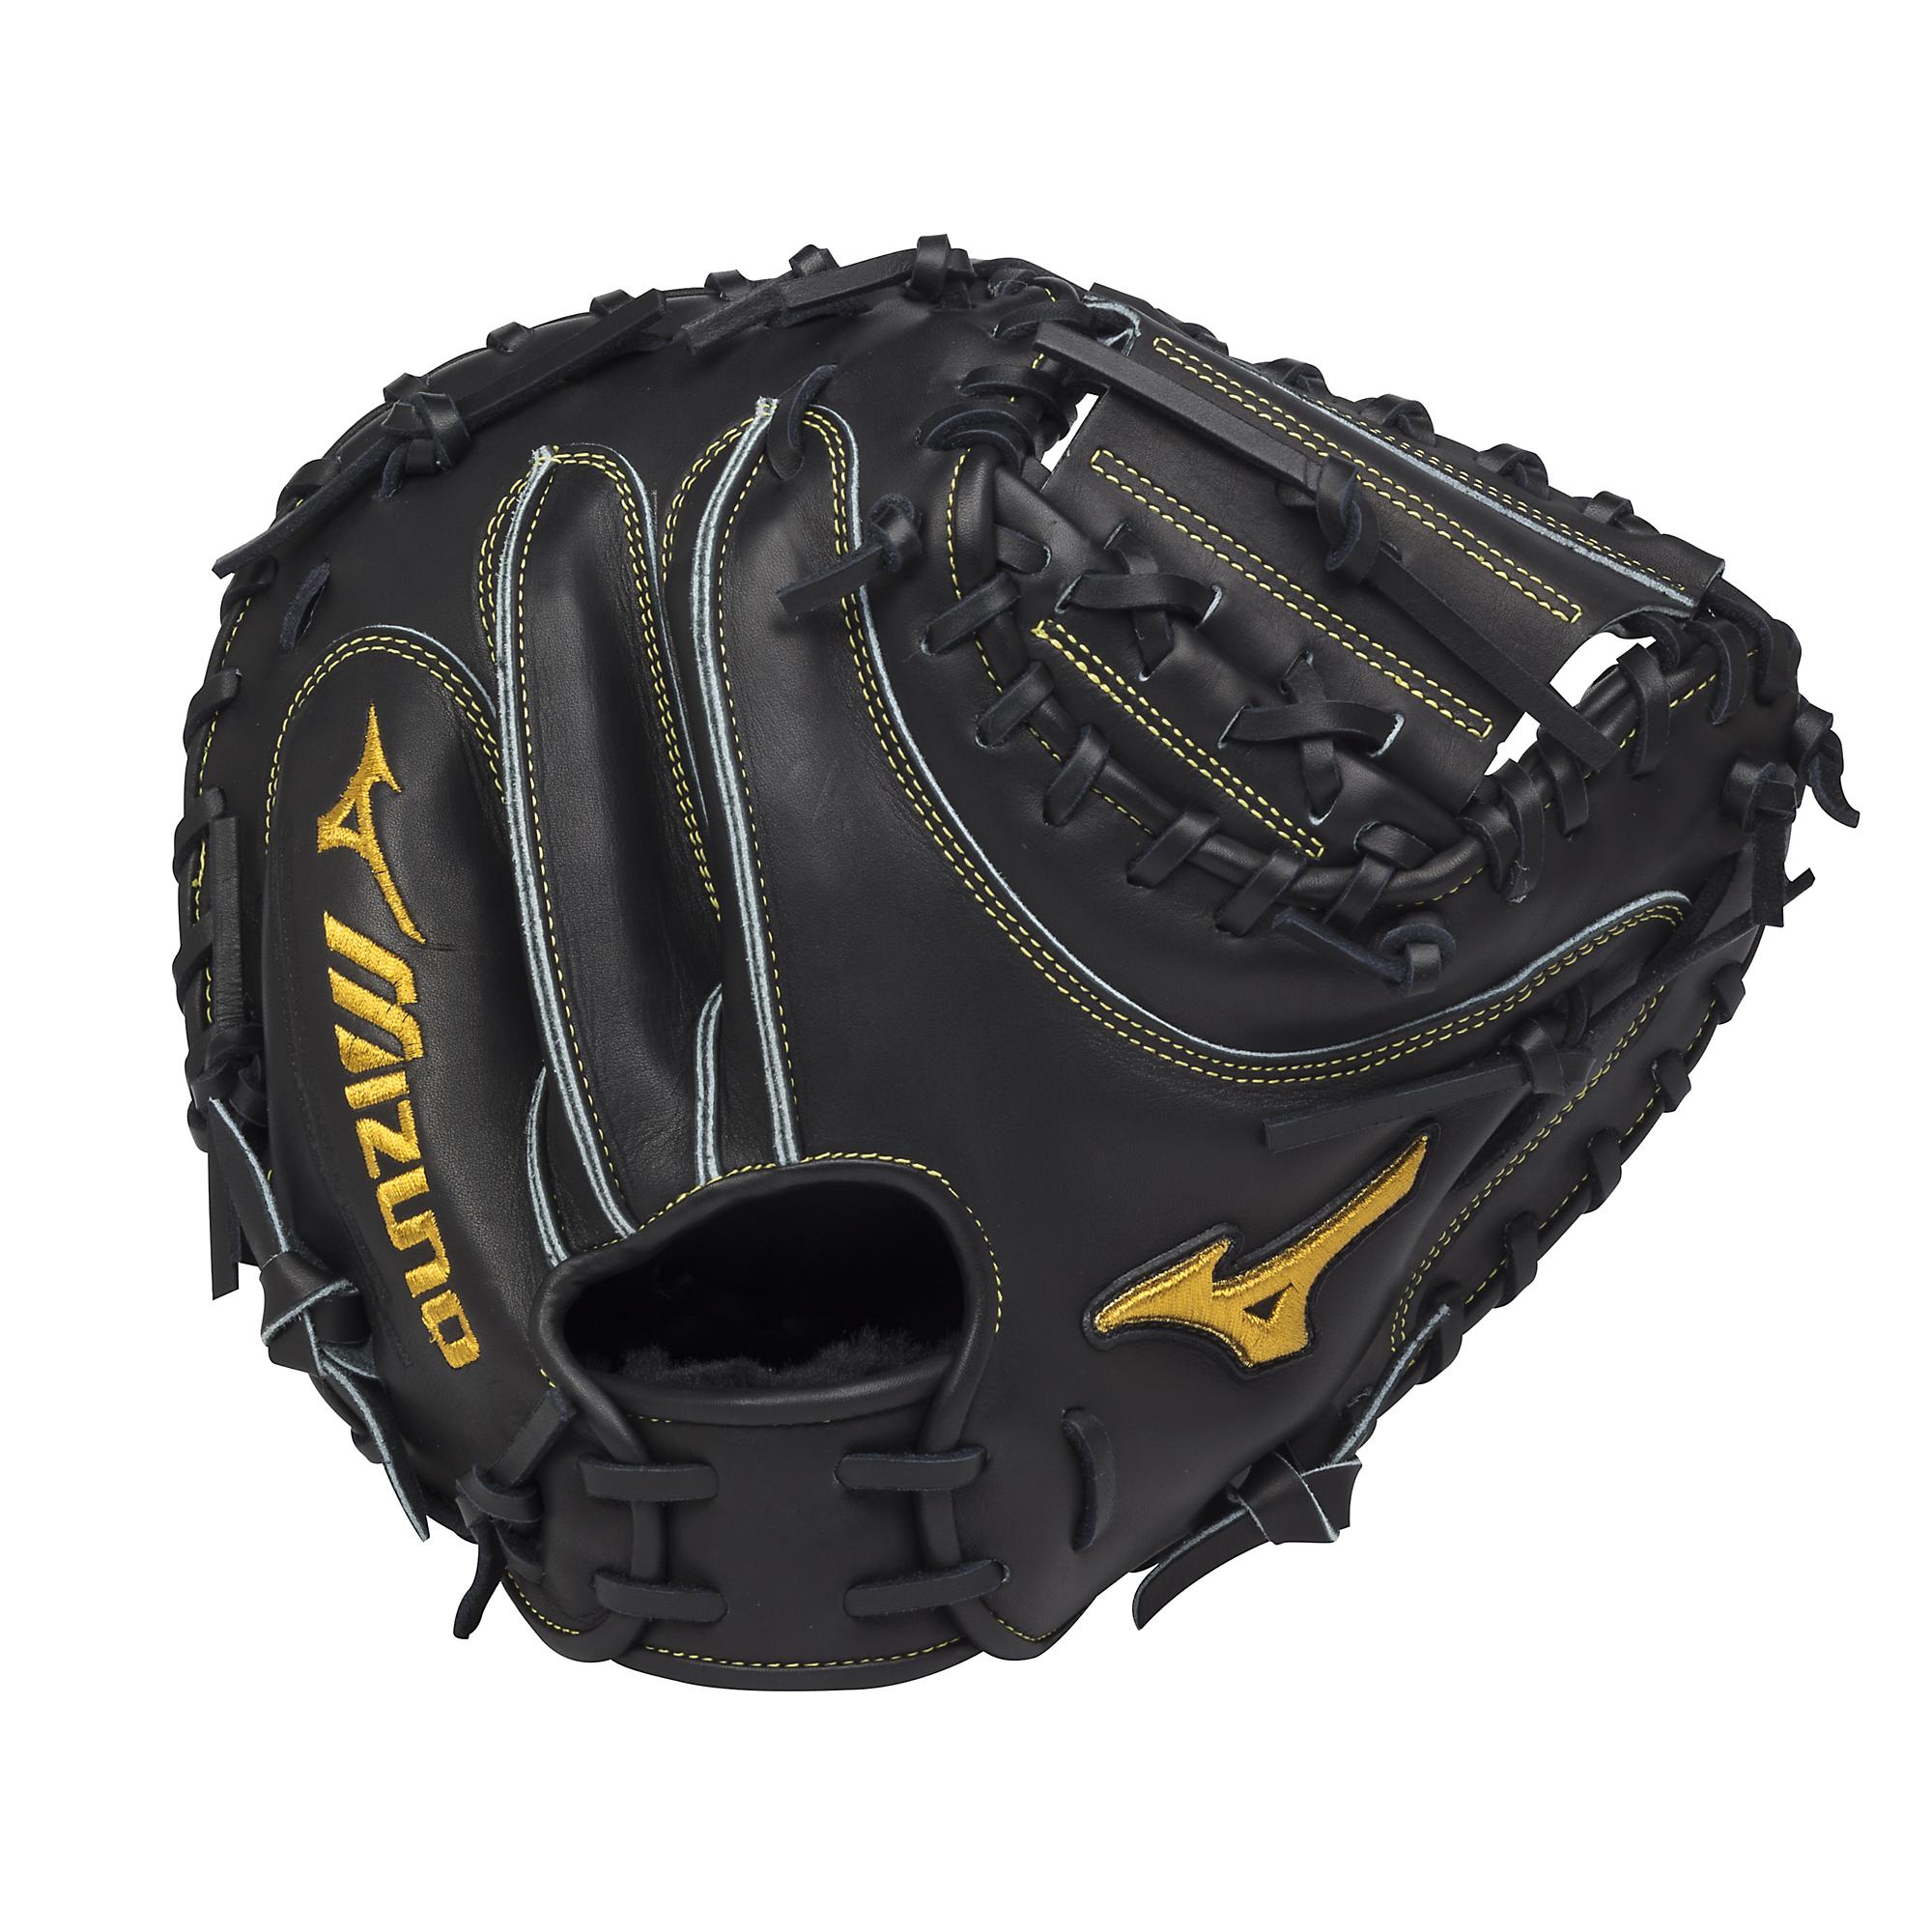 2f1c4ee2766 Baseball Gear   Equipment - Walmart.com